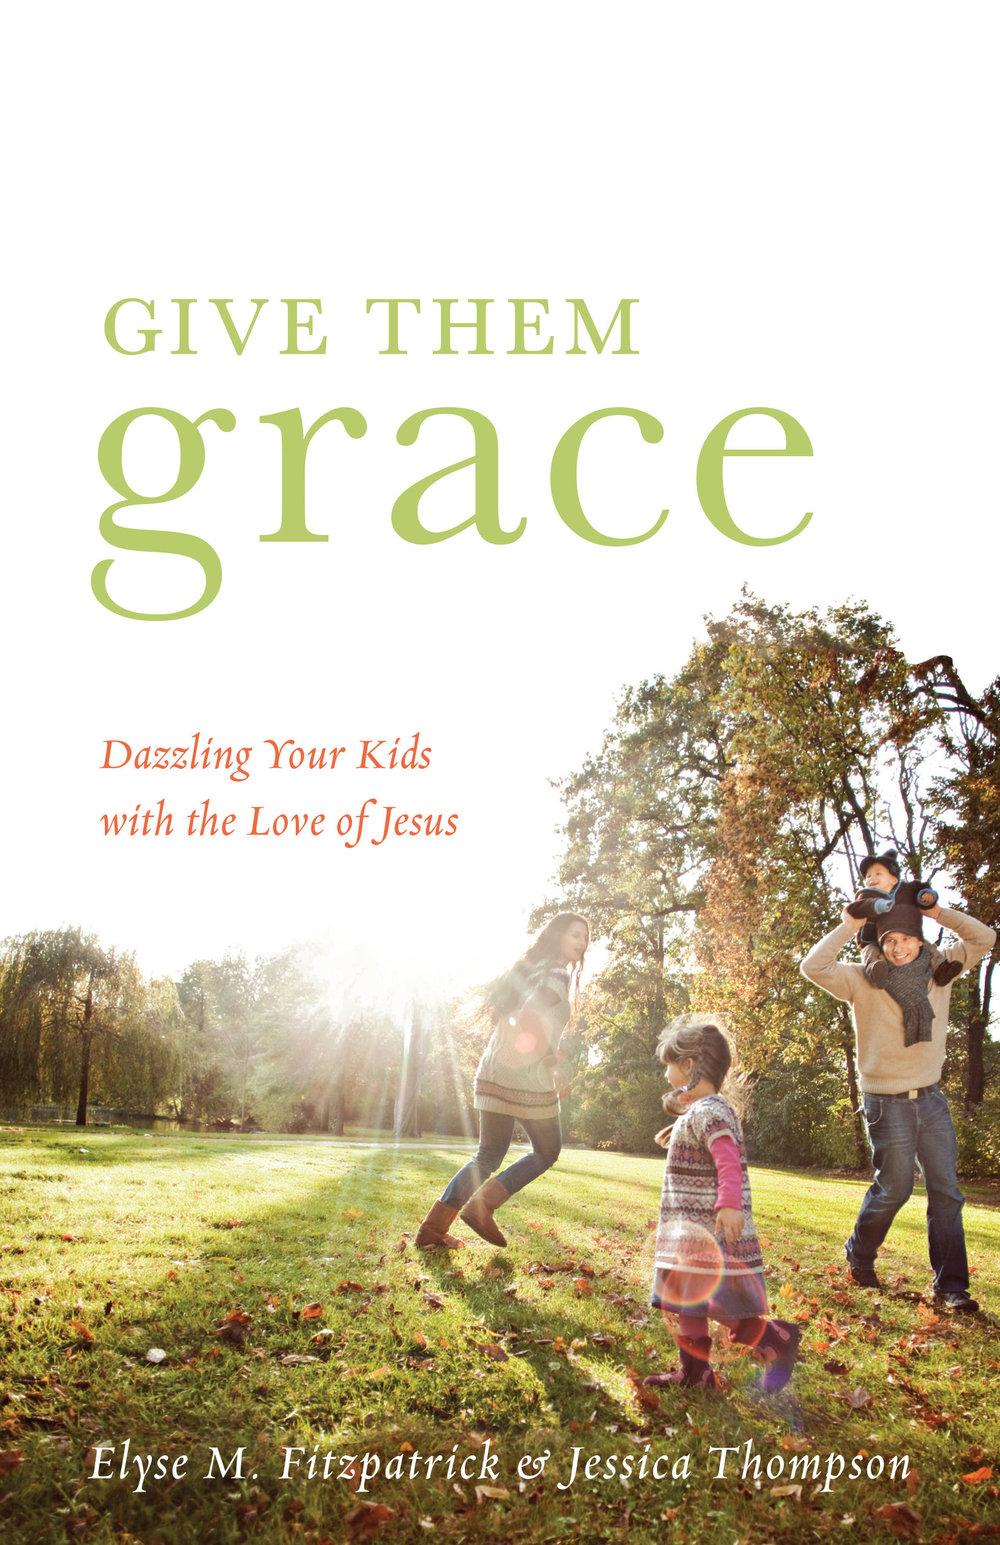 Give Them Grace - Elyse M. Fitzpatrick & Jessica Thompson